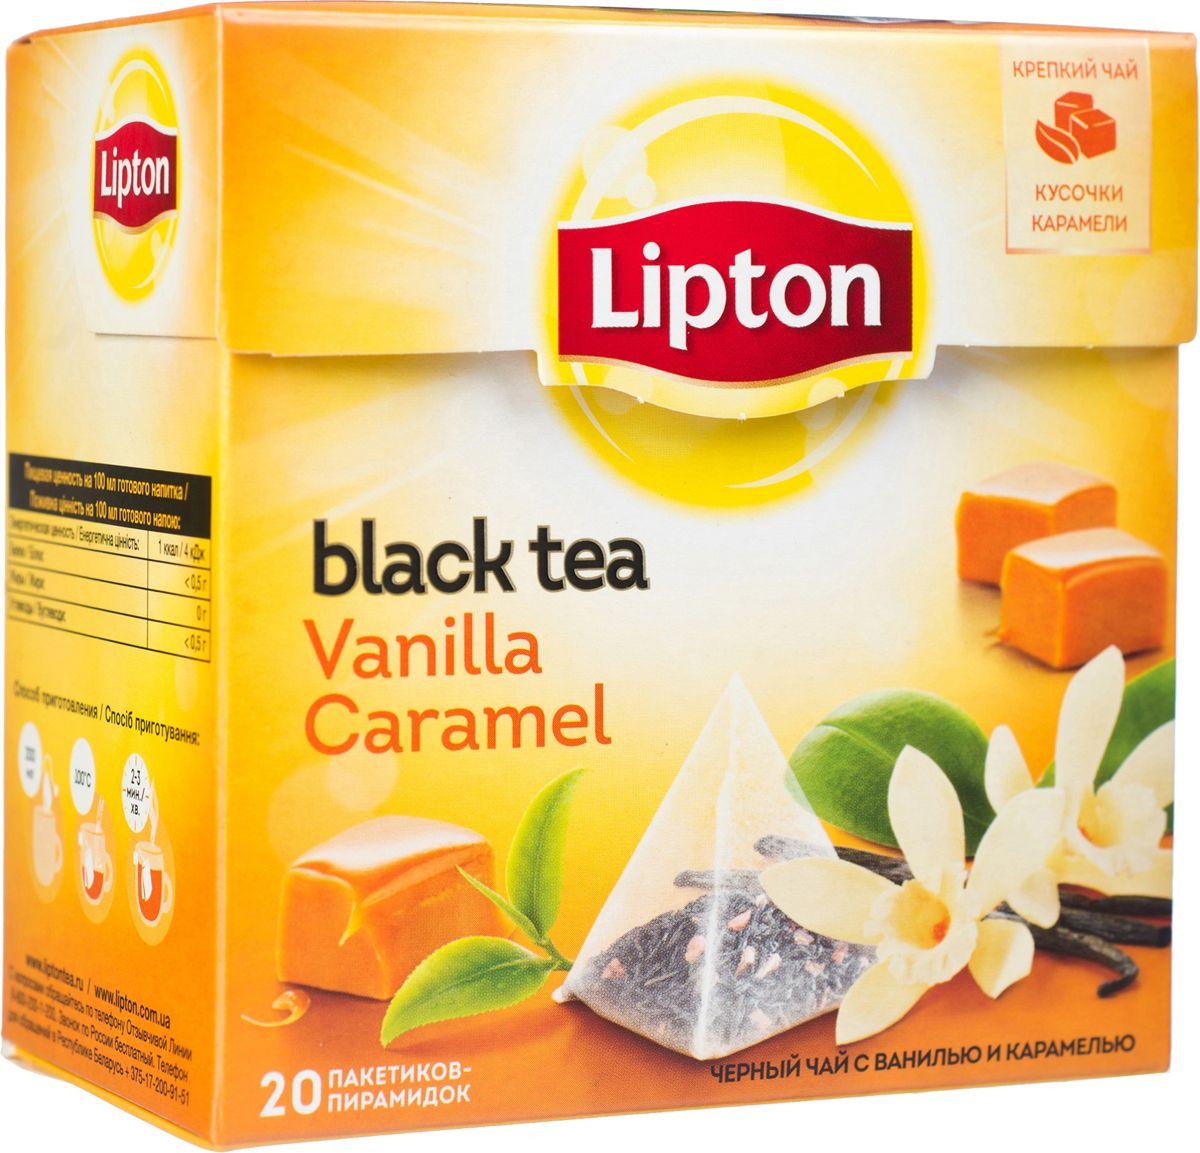 Lipton Черный чай Vanilla Caramel 20 шт21187937/65415415